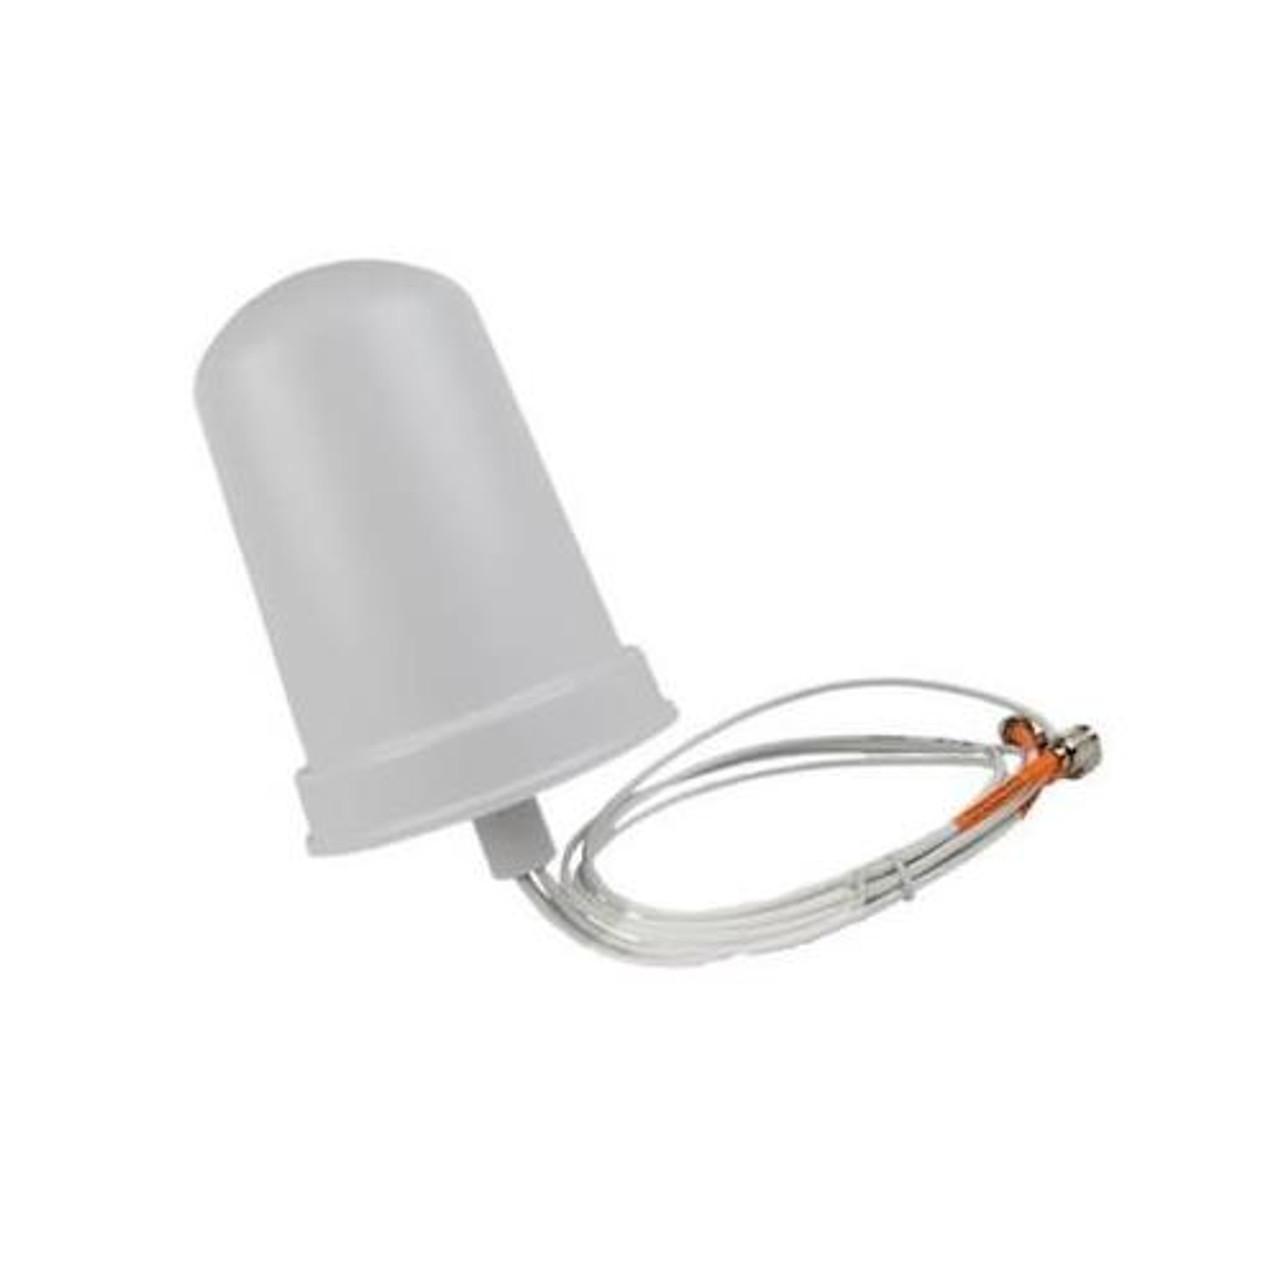 Cisco AIR-ANT2544V4M-R= Aironet Dual Band MIMO Antenna